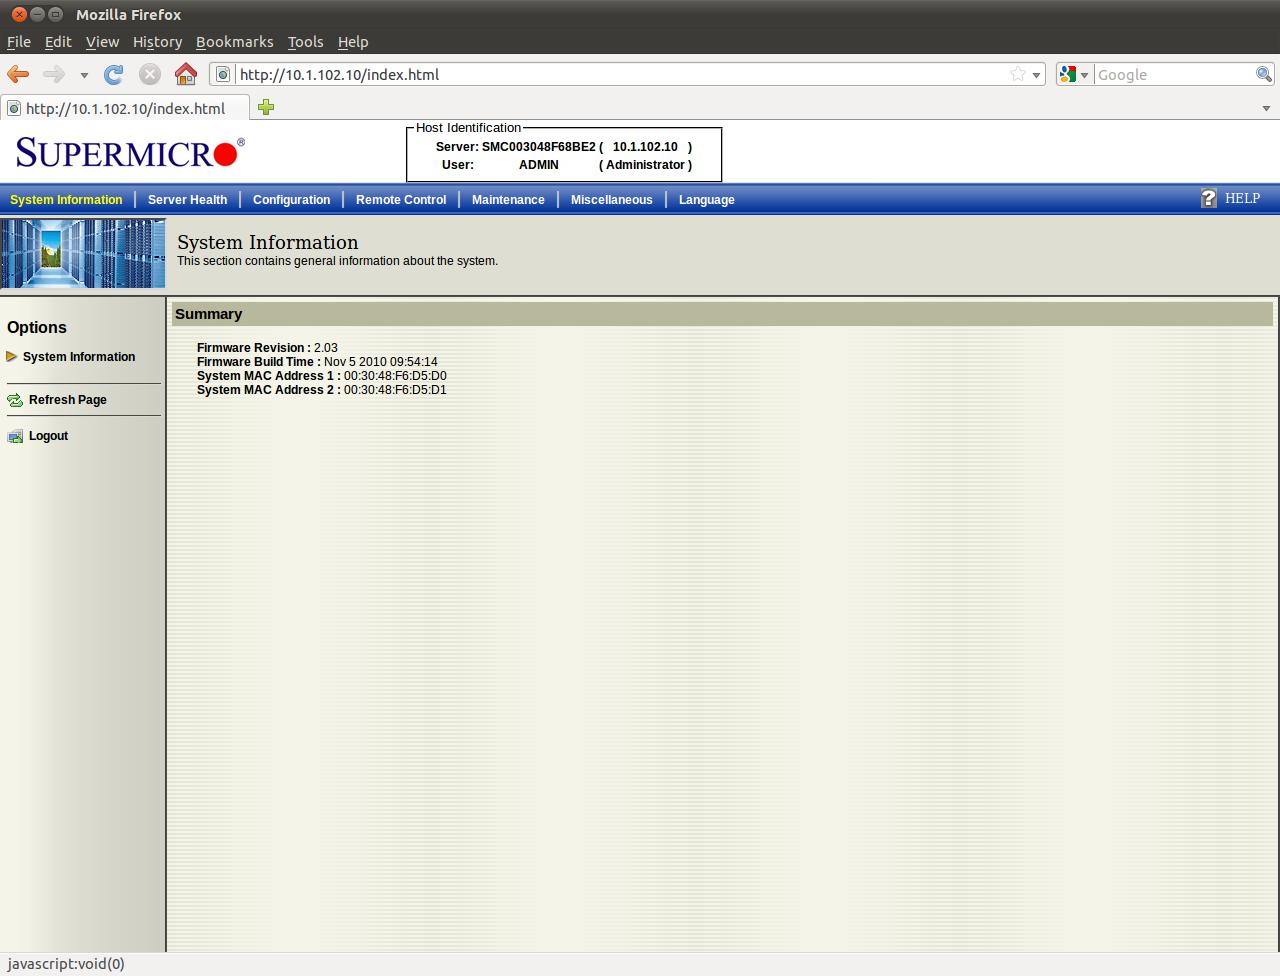 Nuvoton WPCM450R IPMI Chip with AMI-Software - Thomas-Krenn-Wiki